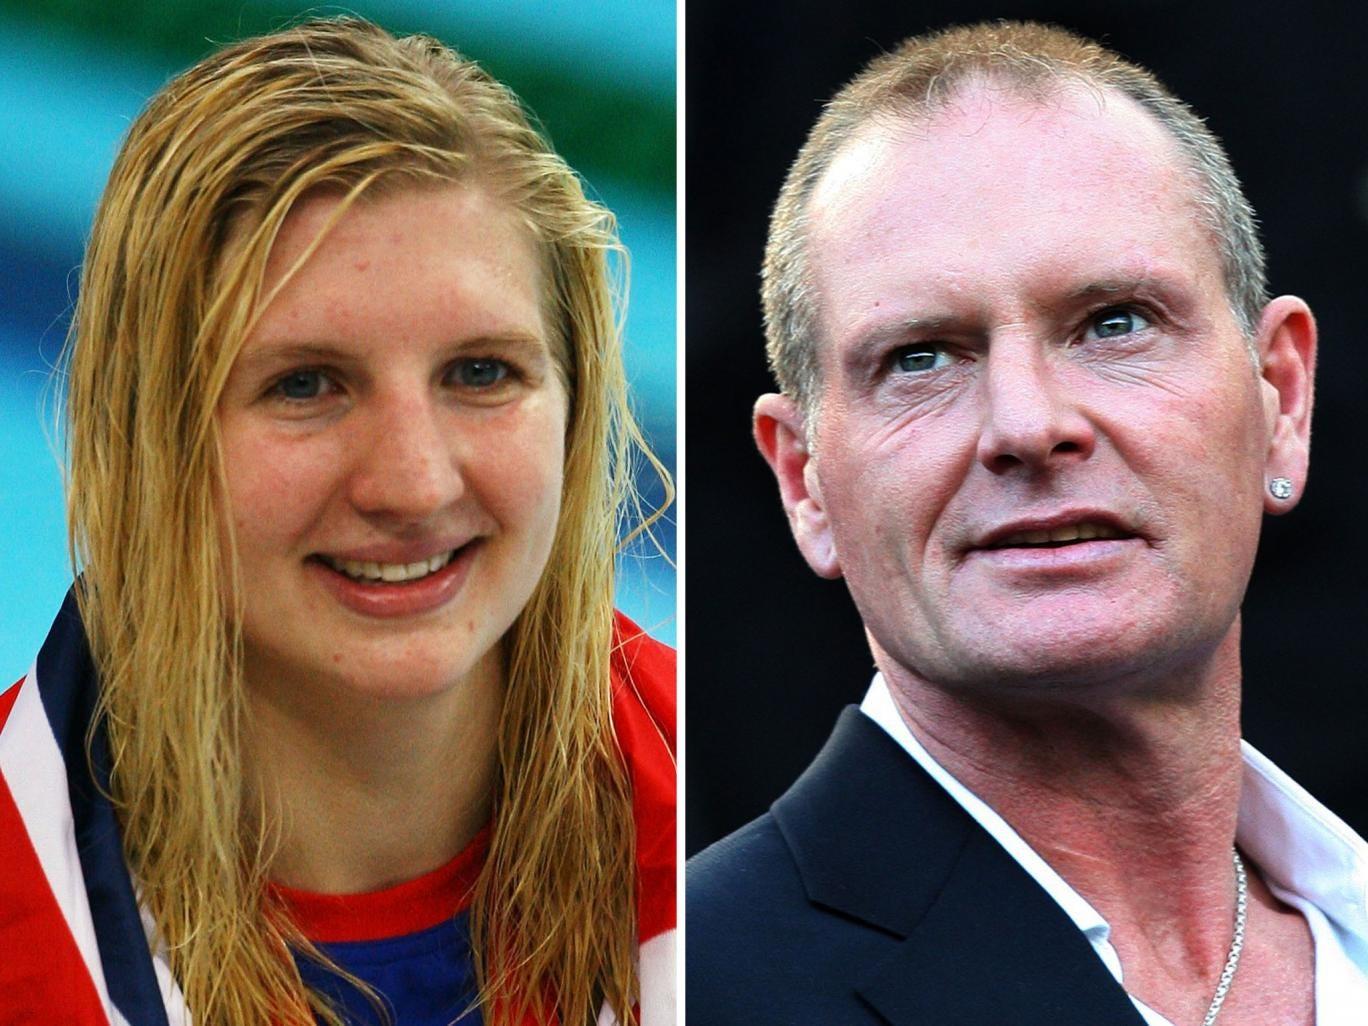 Life after sport: Rebecca Adlington plans to cope, but Paul Gascoigne has struggled